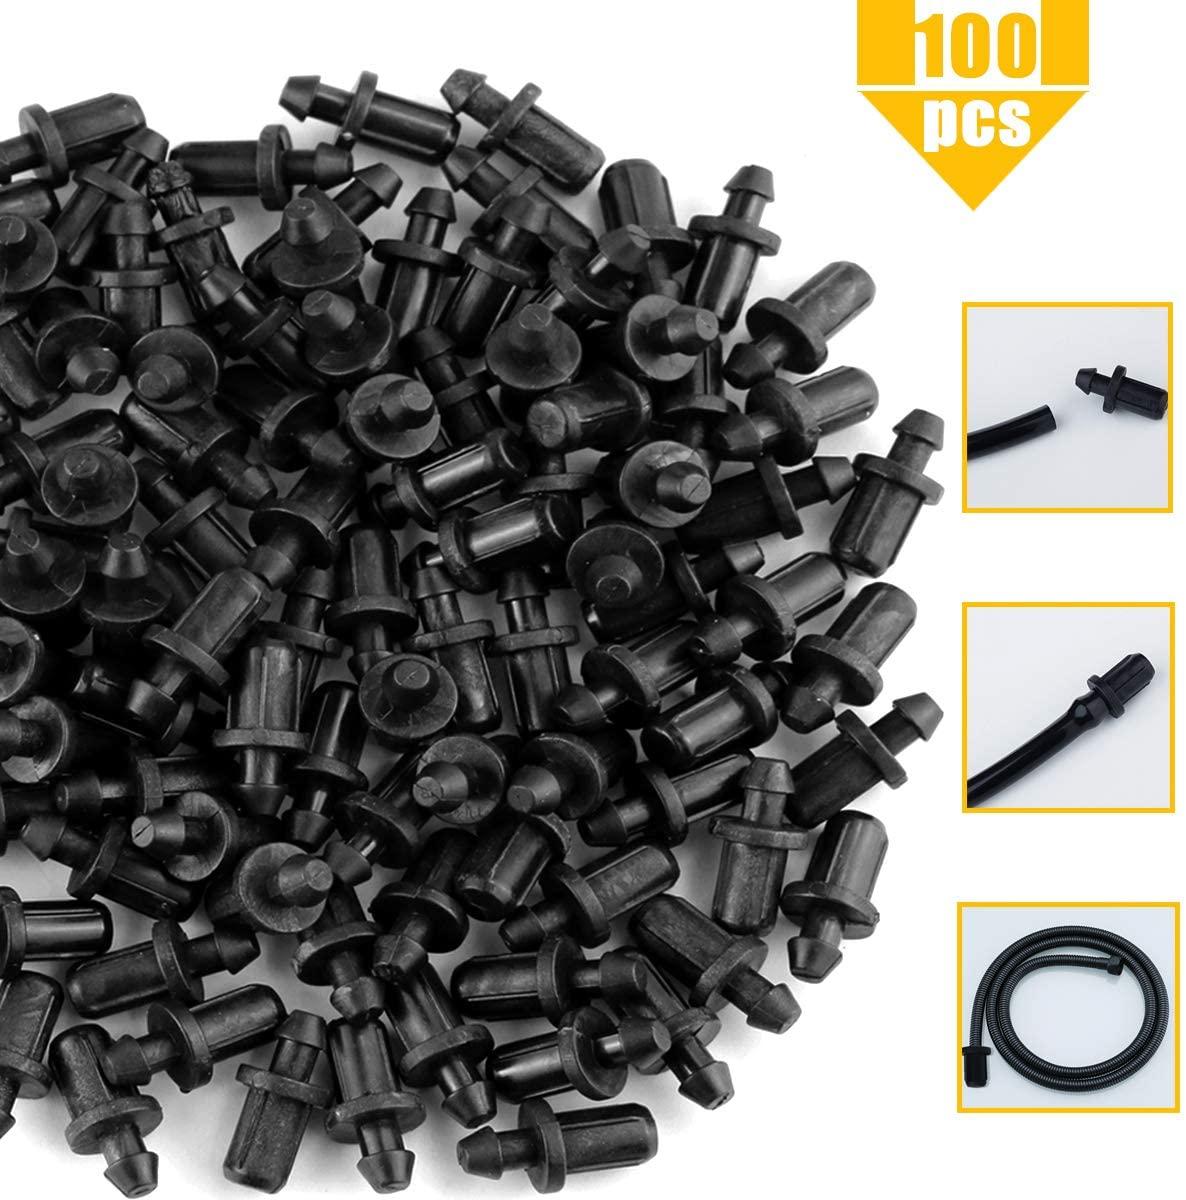 YG_Oline 100 Pcs Black Plug Drip Irrigation Tubing Plug Drip Barbed End Plug Goof Plugs Drip End Plug Closure